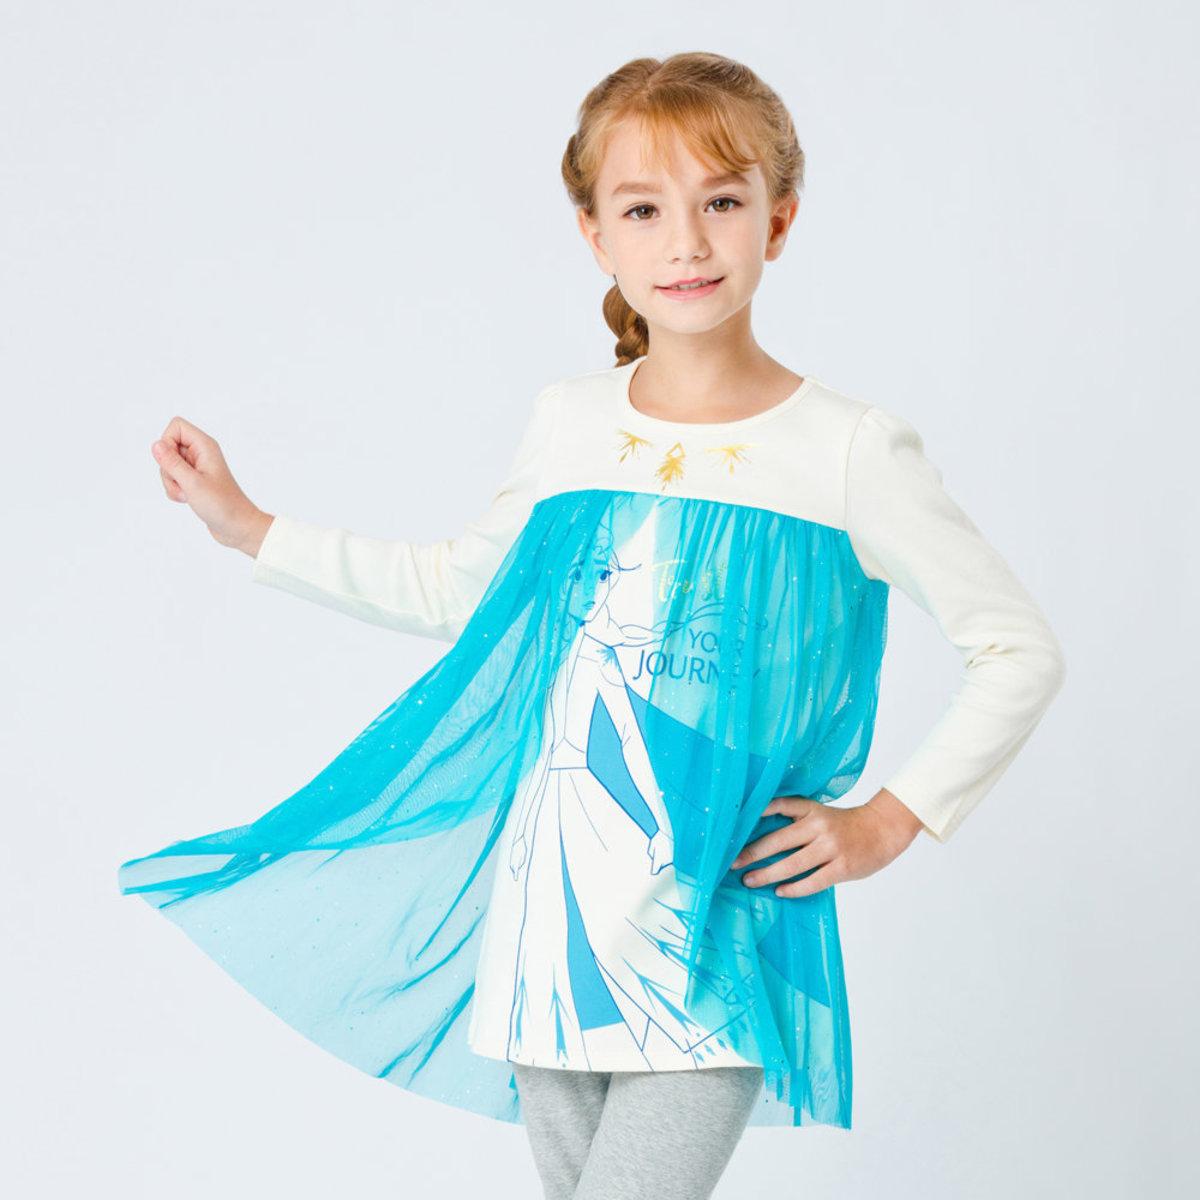 Frozen II 魔雪奇緣2 長袖公主袖紗裙  [迪士尼許可產品] - #D0507